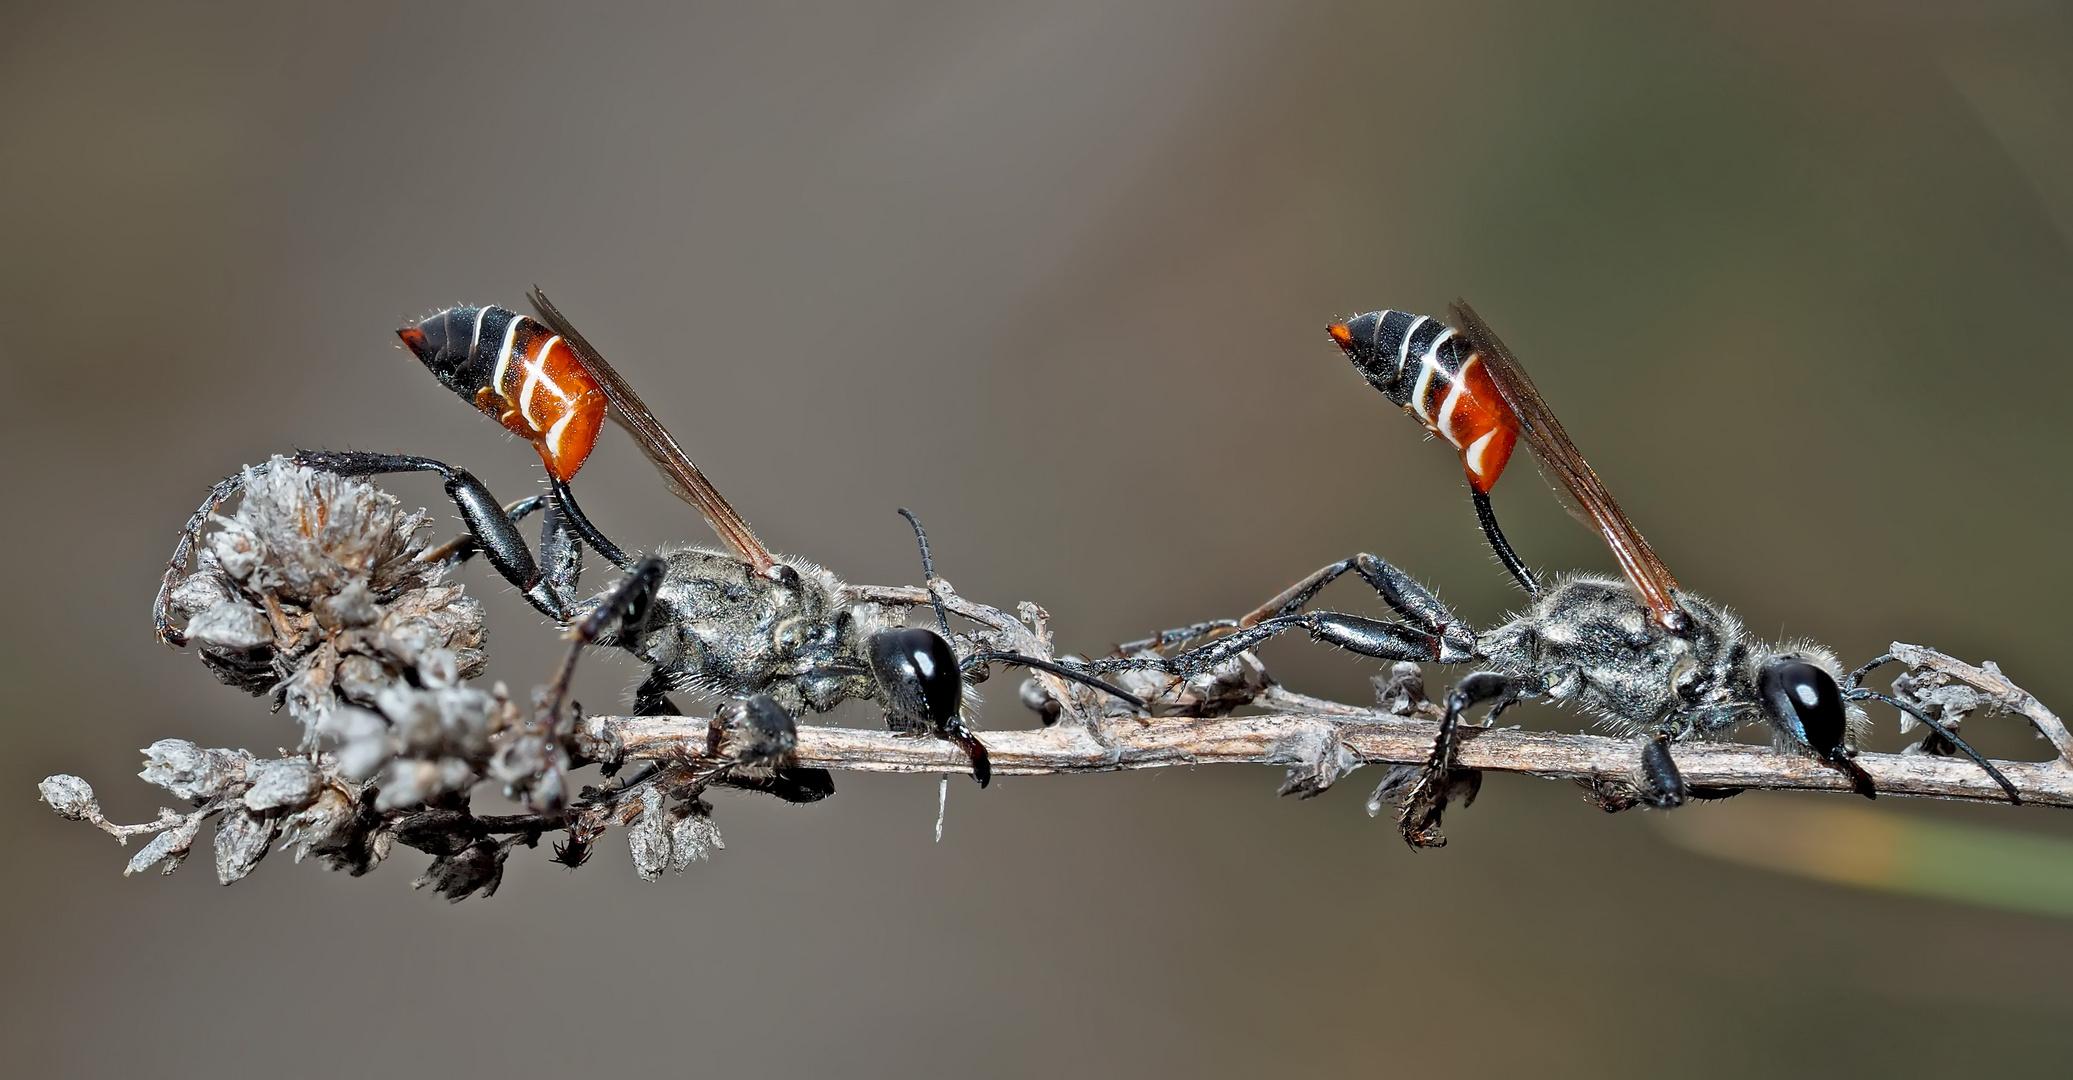 Faszinierend: Prionyx kirbii, eine seltene Grabwespe! *  - Une découverte étonnante et fascinante!